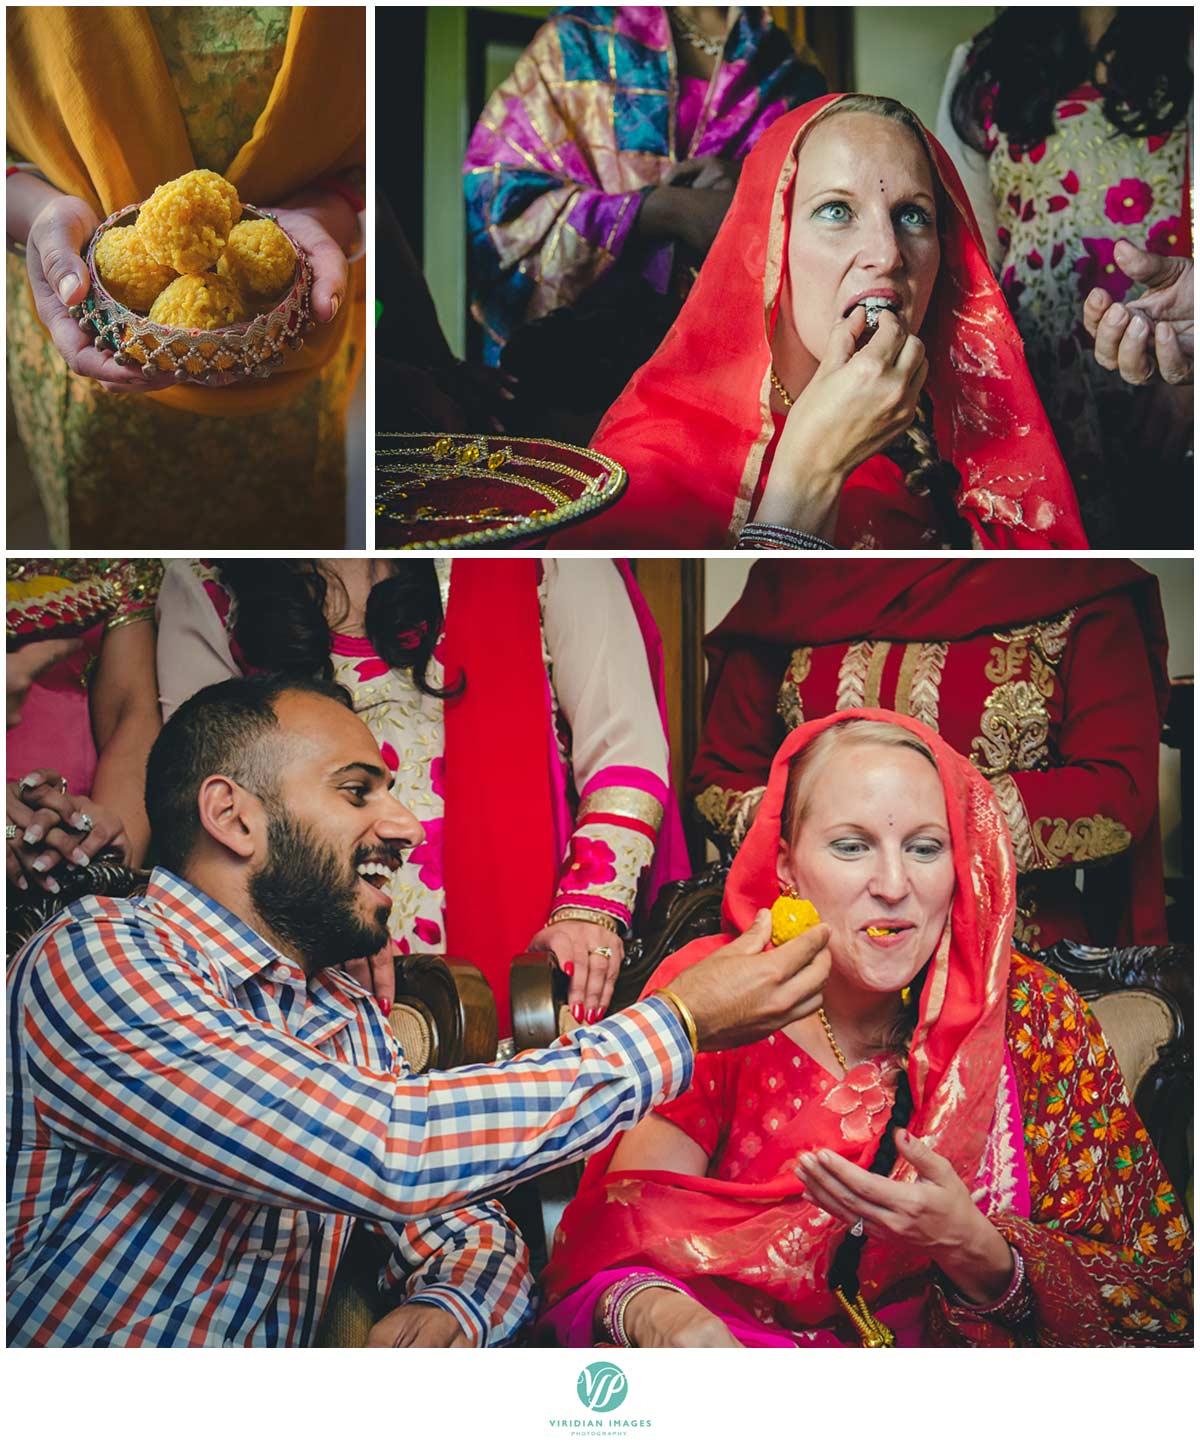 India_Wedding_Chandigarh_Cerenonies_Viridian_Images_Photography_photo_5